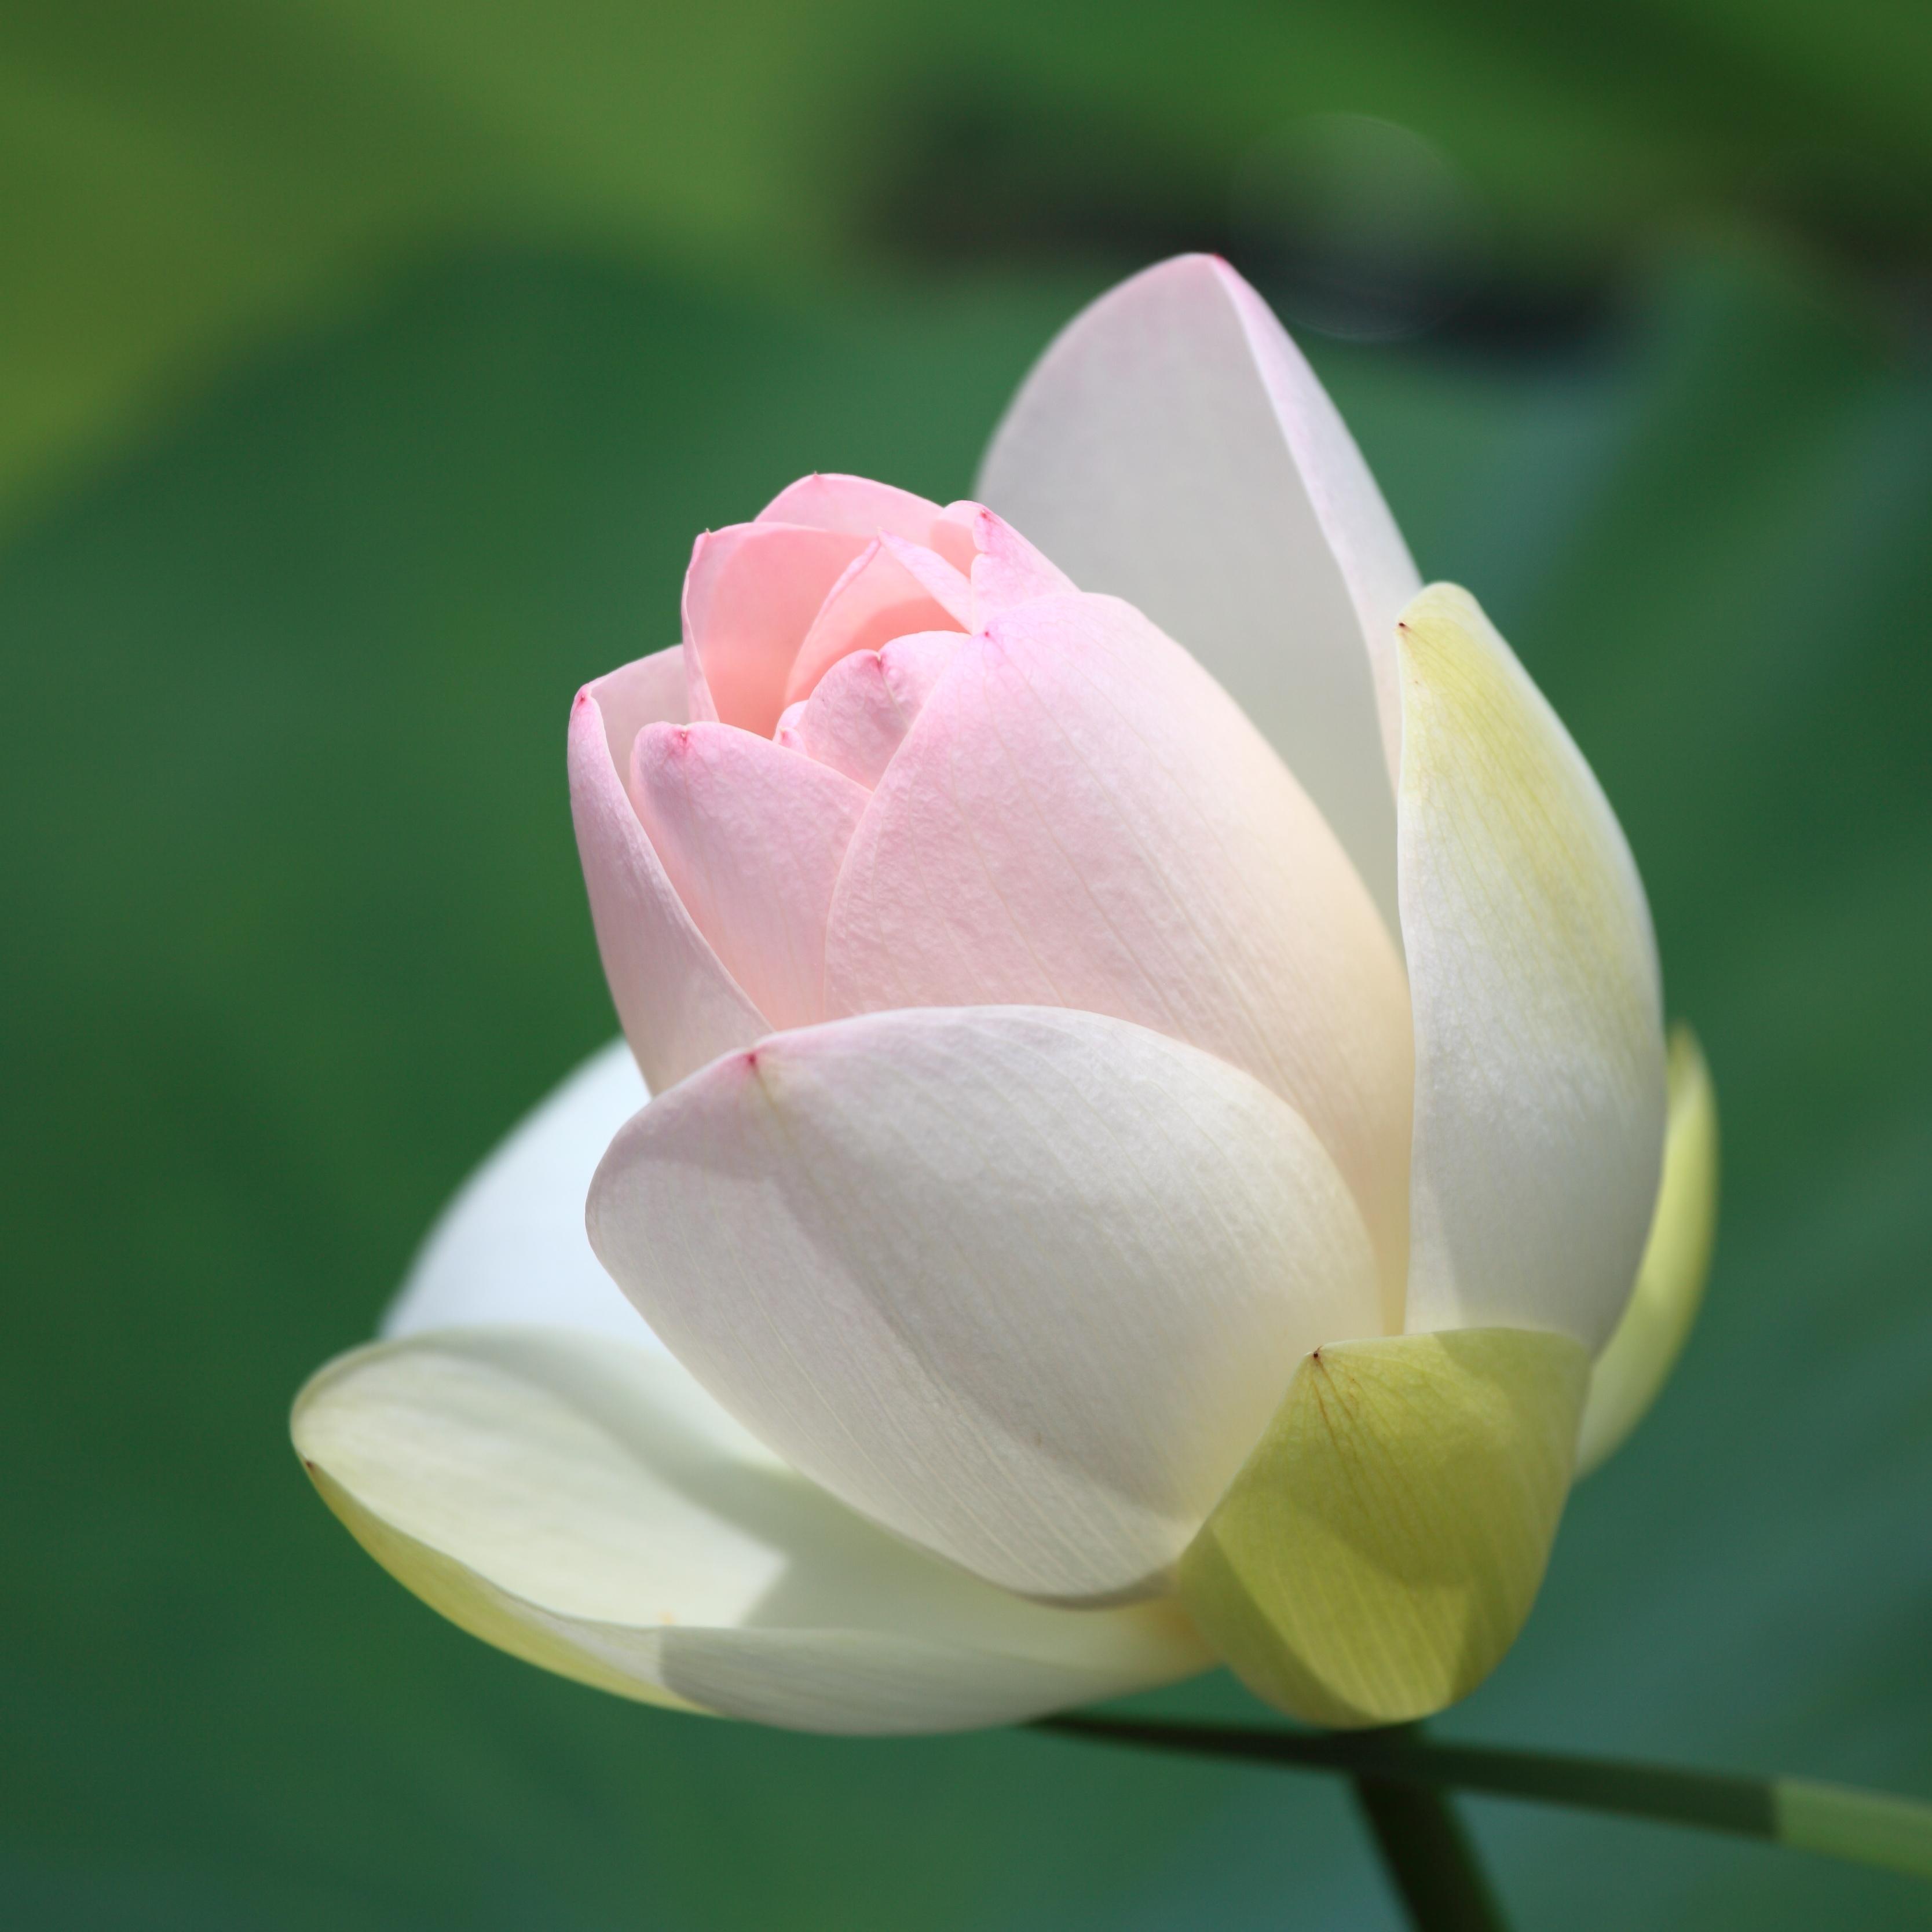 Free Images Blossom Flower Petal High Pink Sacred Lotus